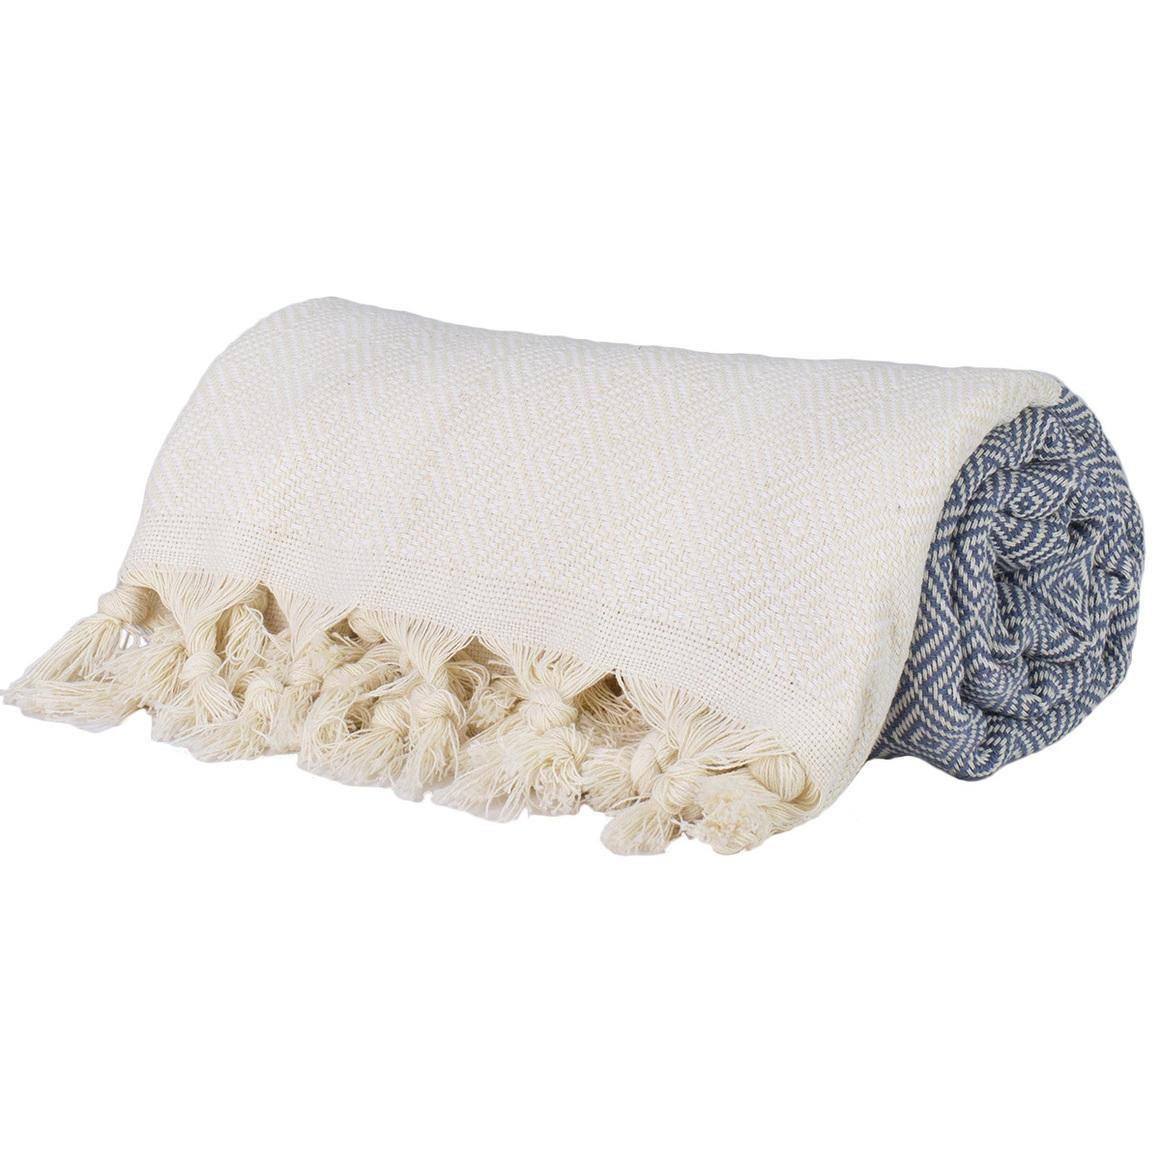 PETROLEUM GREY TURKISH TOWEL - THICK | Trada Marketplace